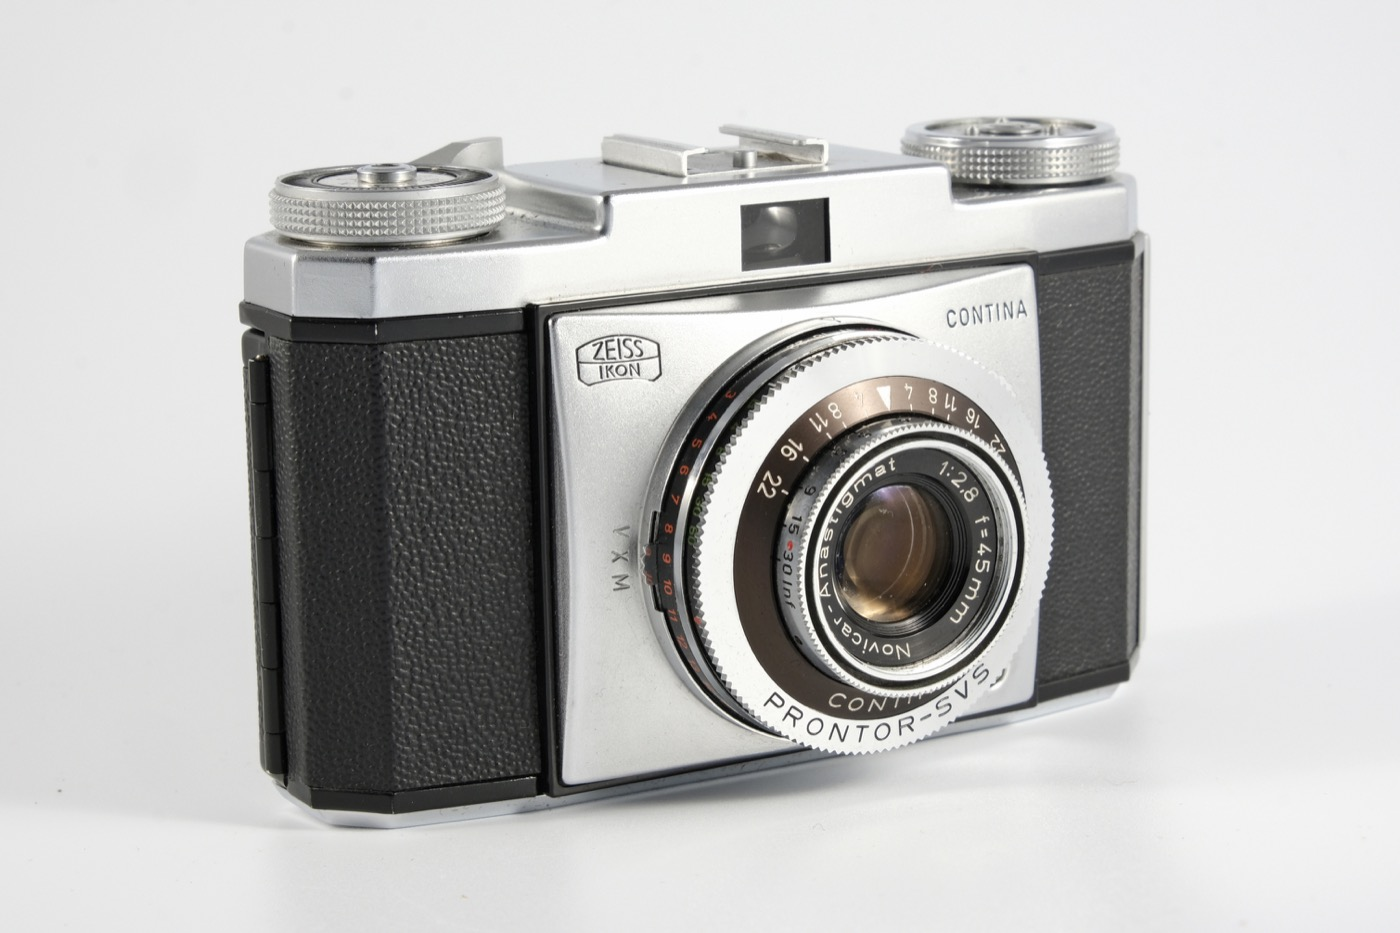 Zeiss Ikon Contina Ib camera